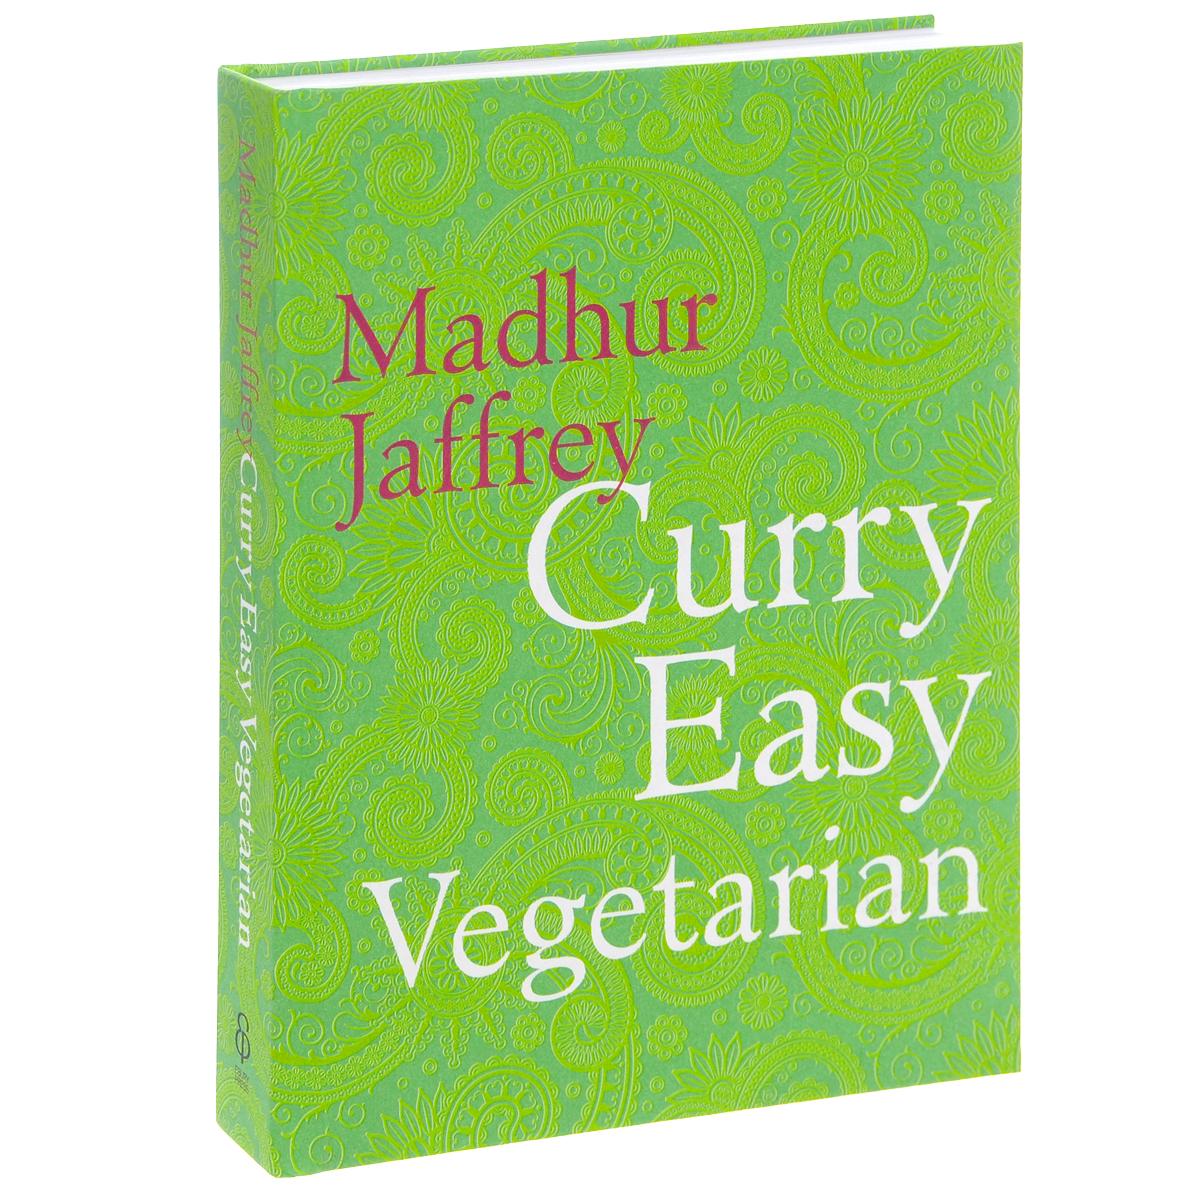 Curry Easy Vegetarian jaffrey madhur my kitchen table 100 weeknight curries